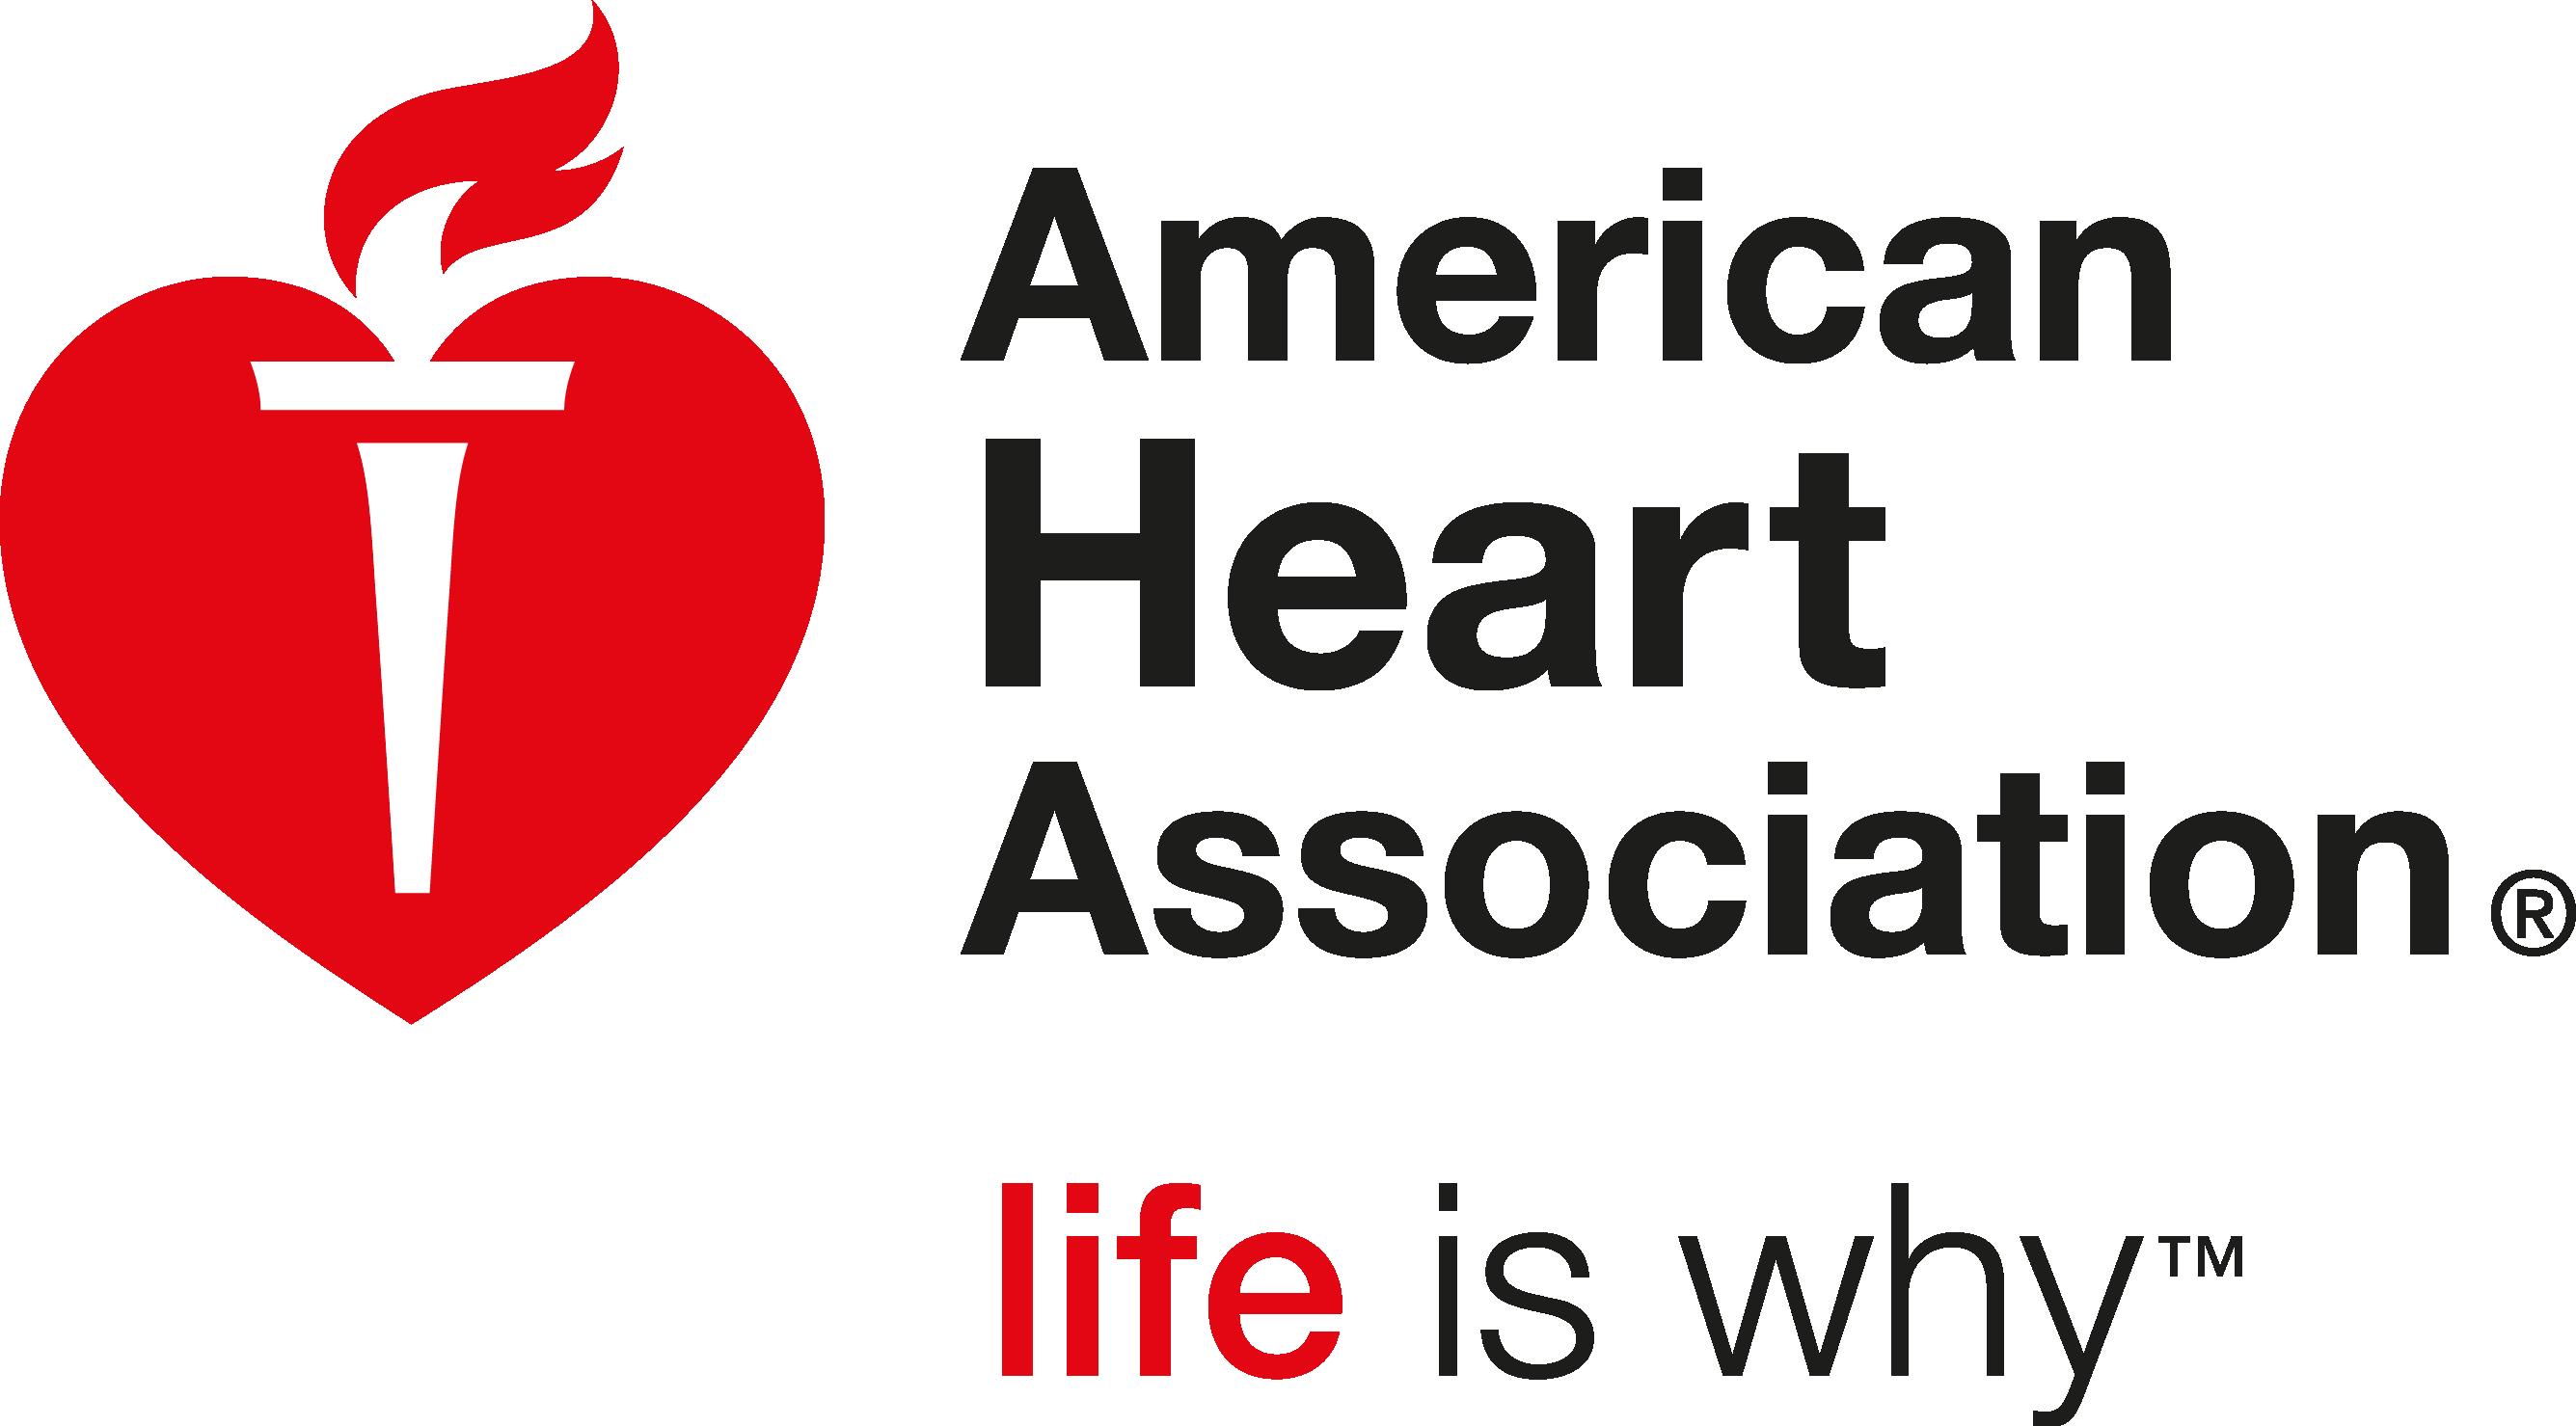 American Hearth Association Logo Aha Png Free Downloads Heart Association American Heart Association Cpr Training